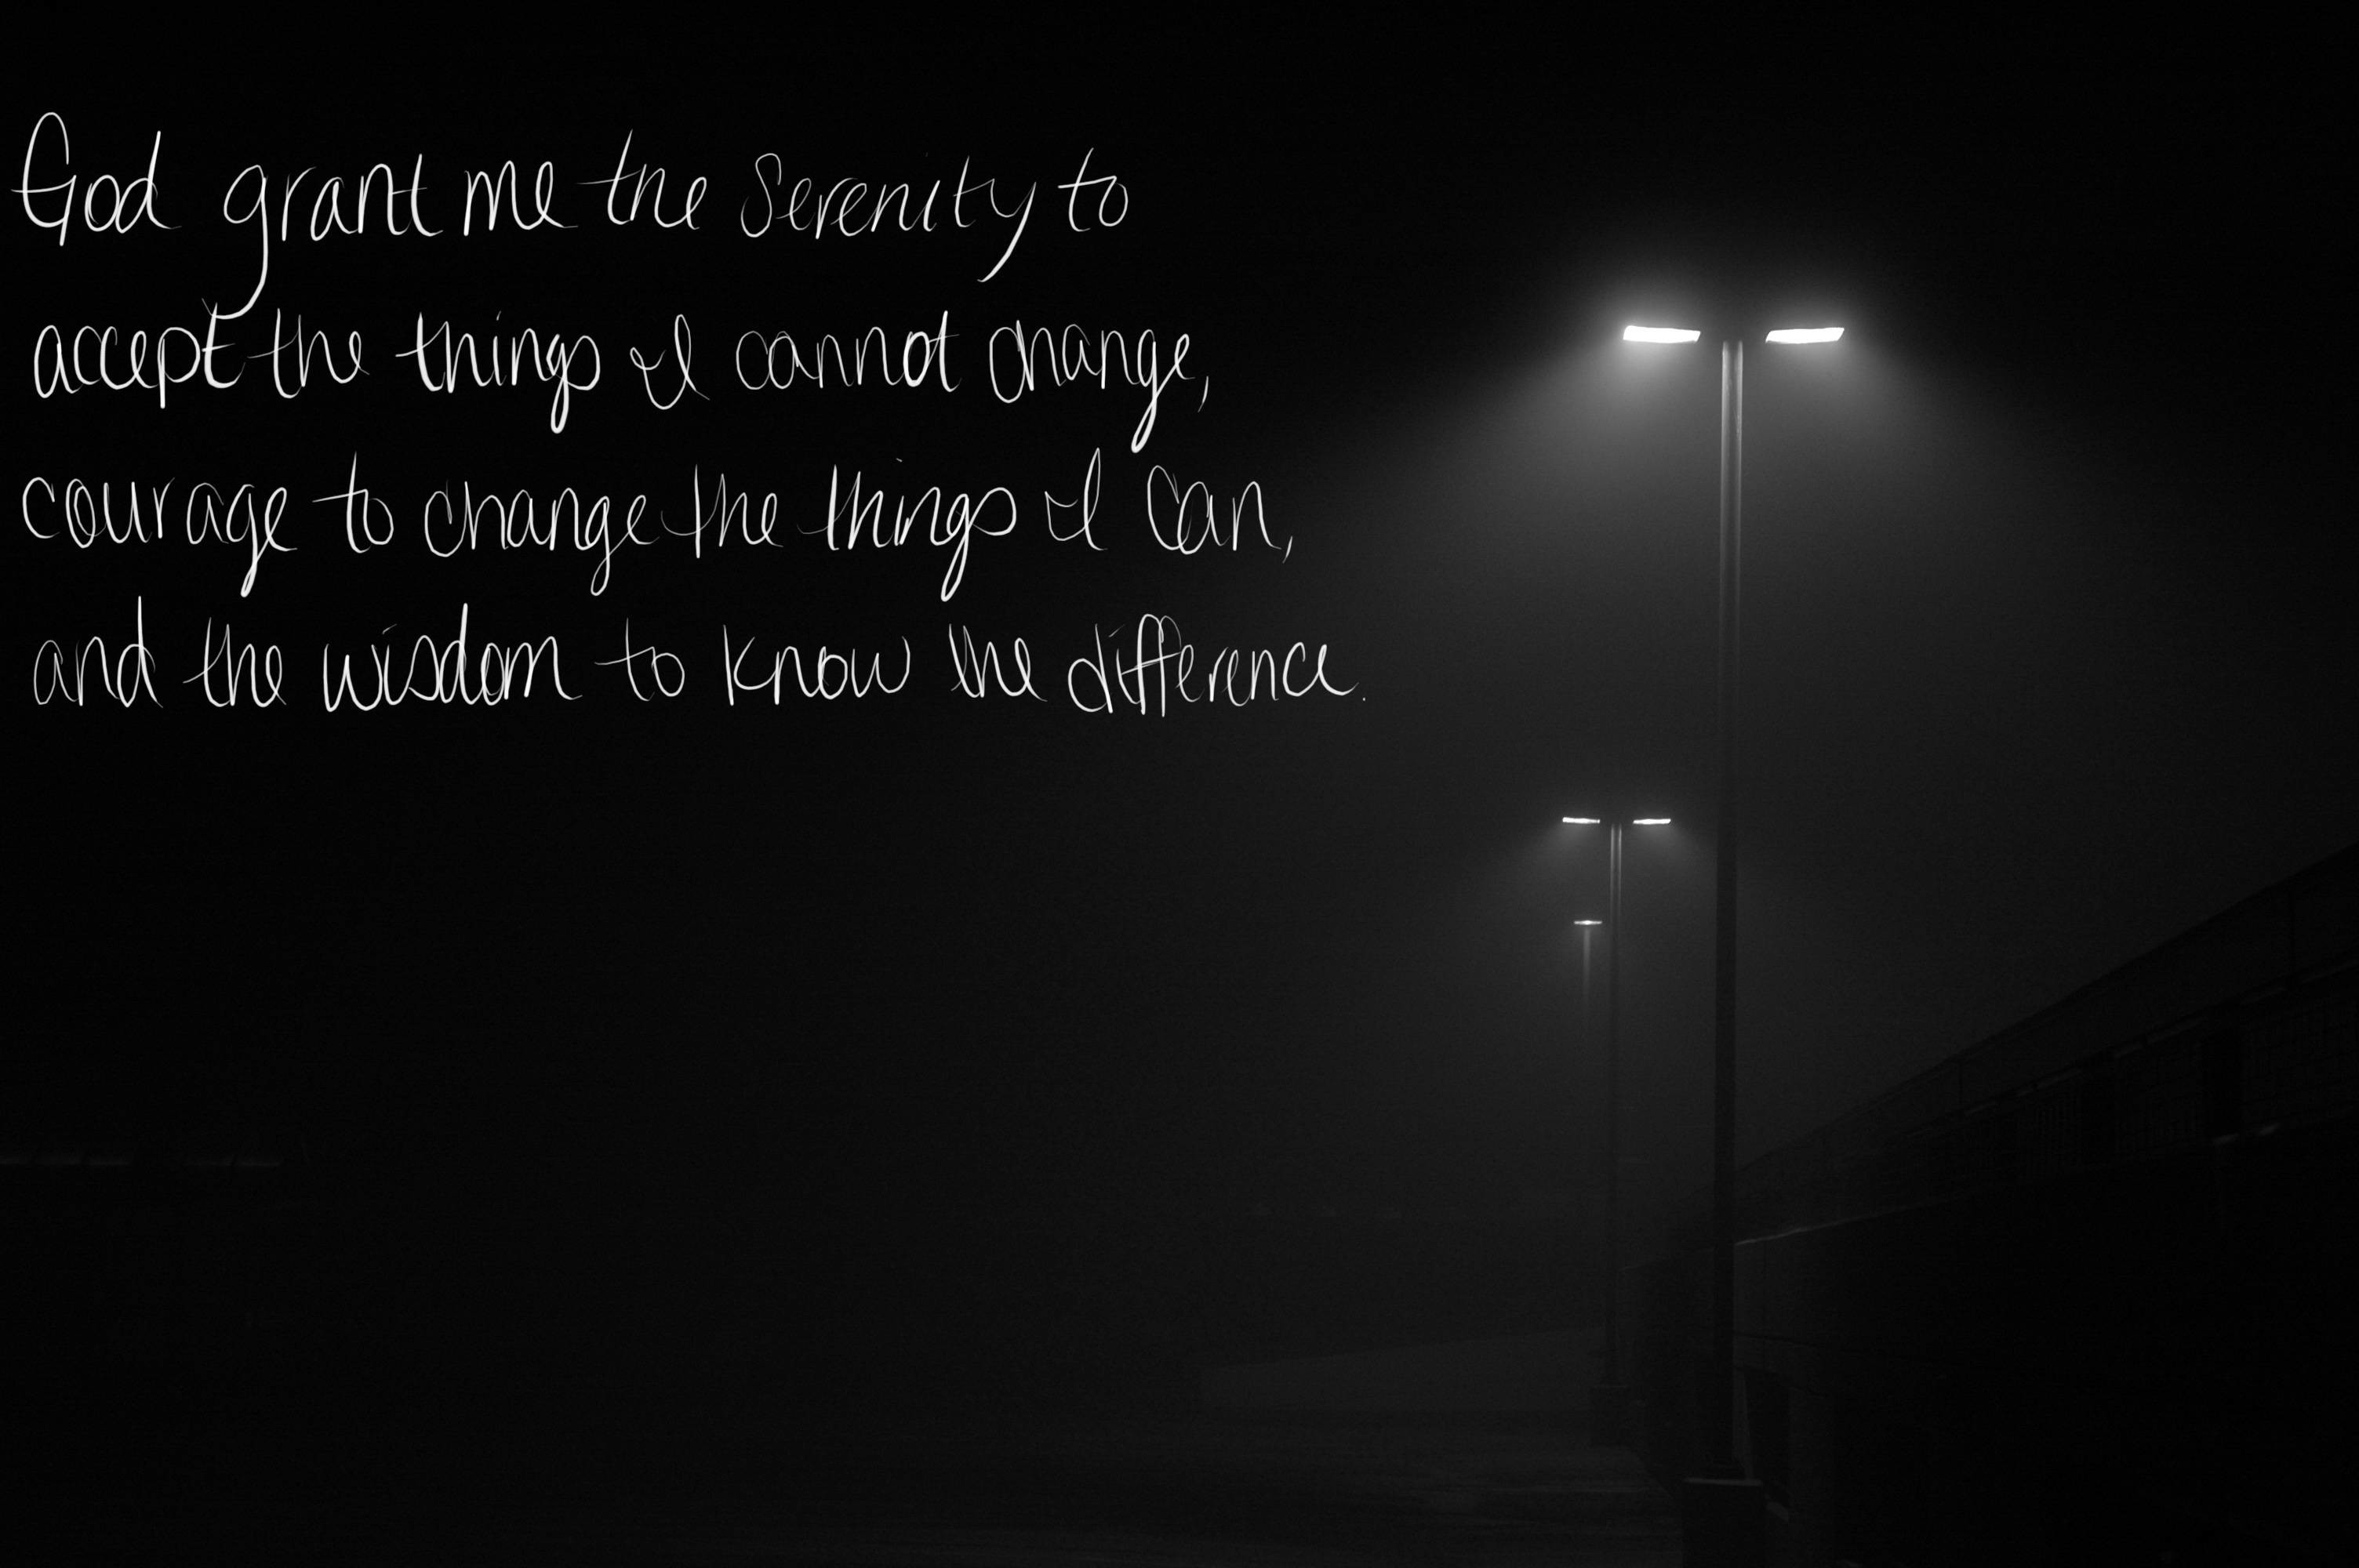 Serenity Prayer Wallpaper Screensaver 50 Images